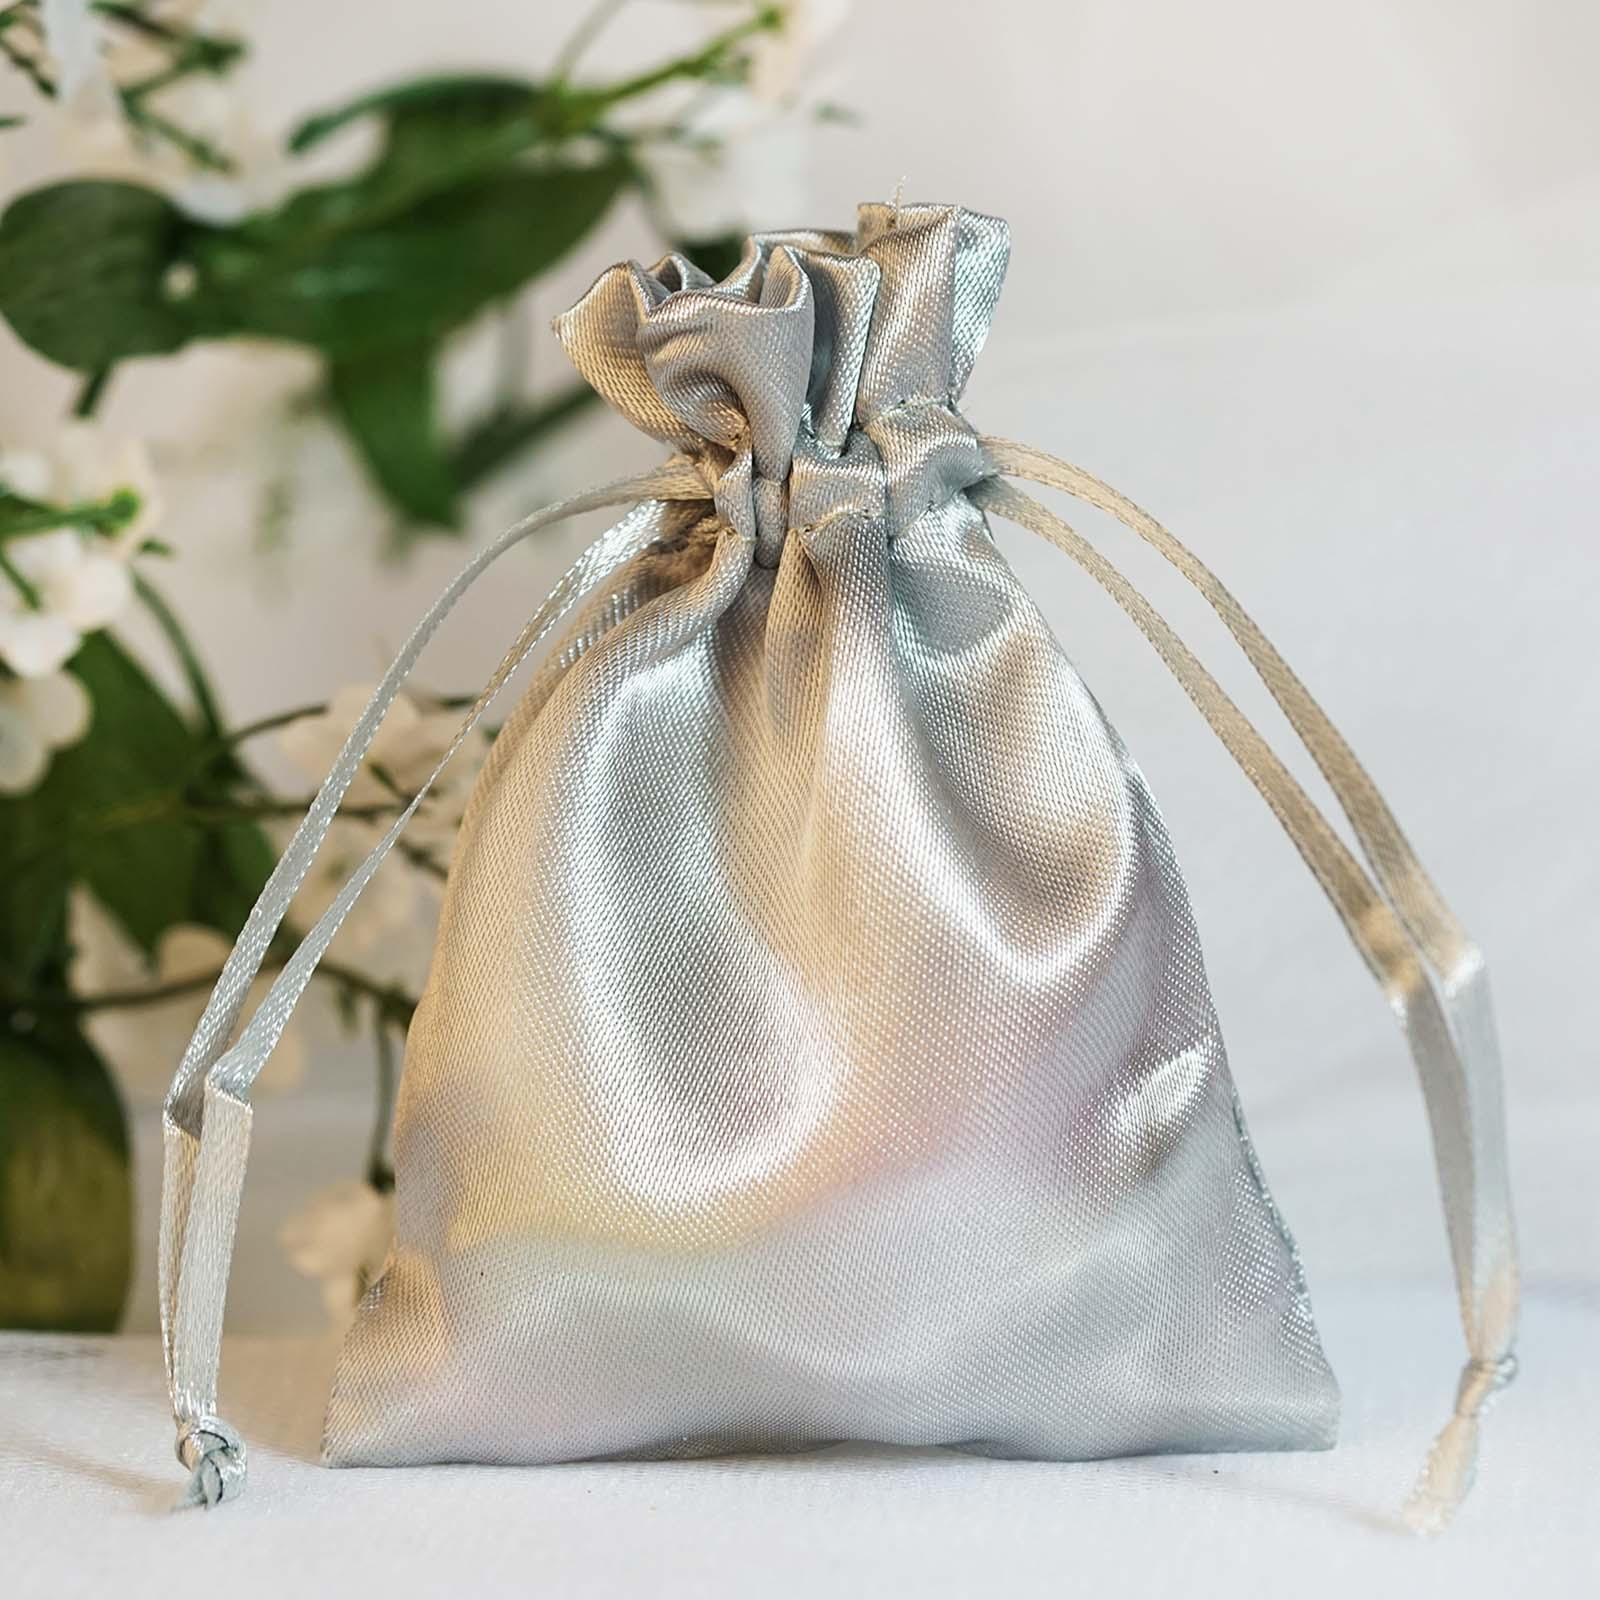 60 Pcs 3x35 Inch Satin Drawstring Favor Bags Wedding Gift Pouches